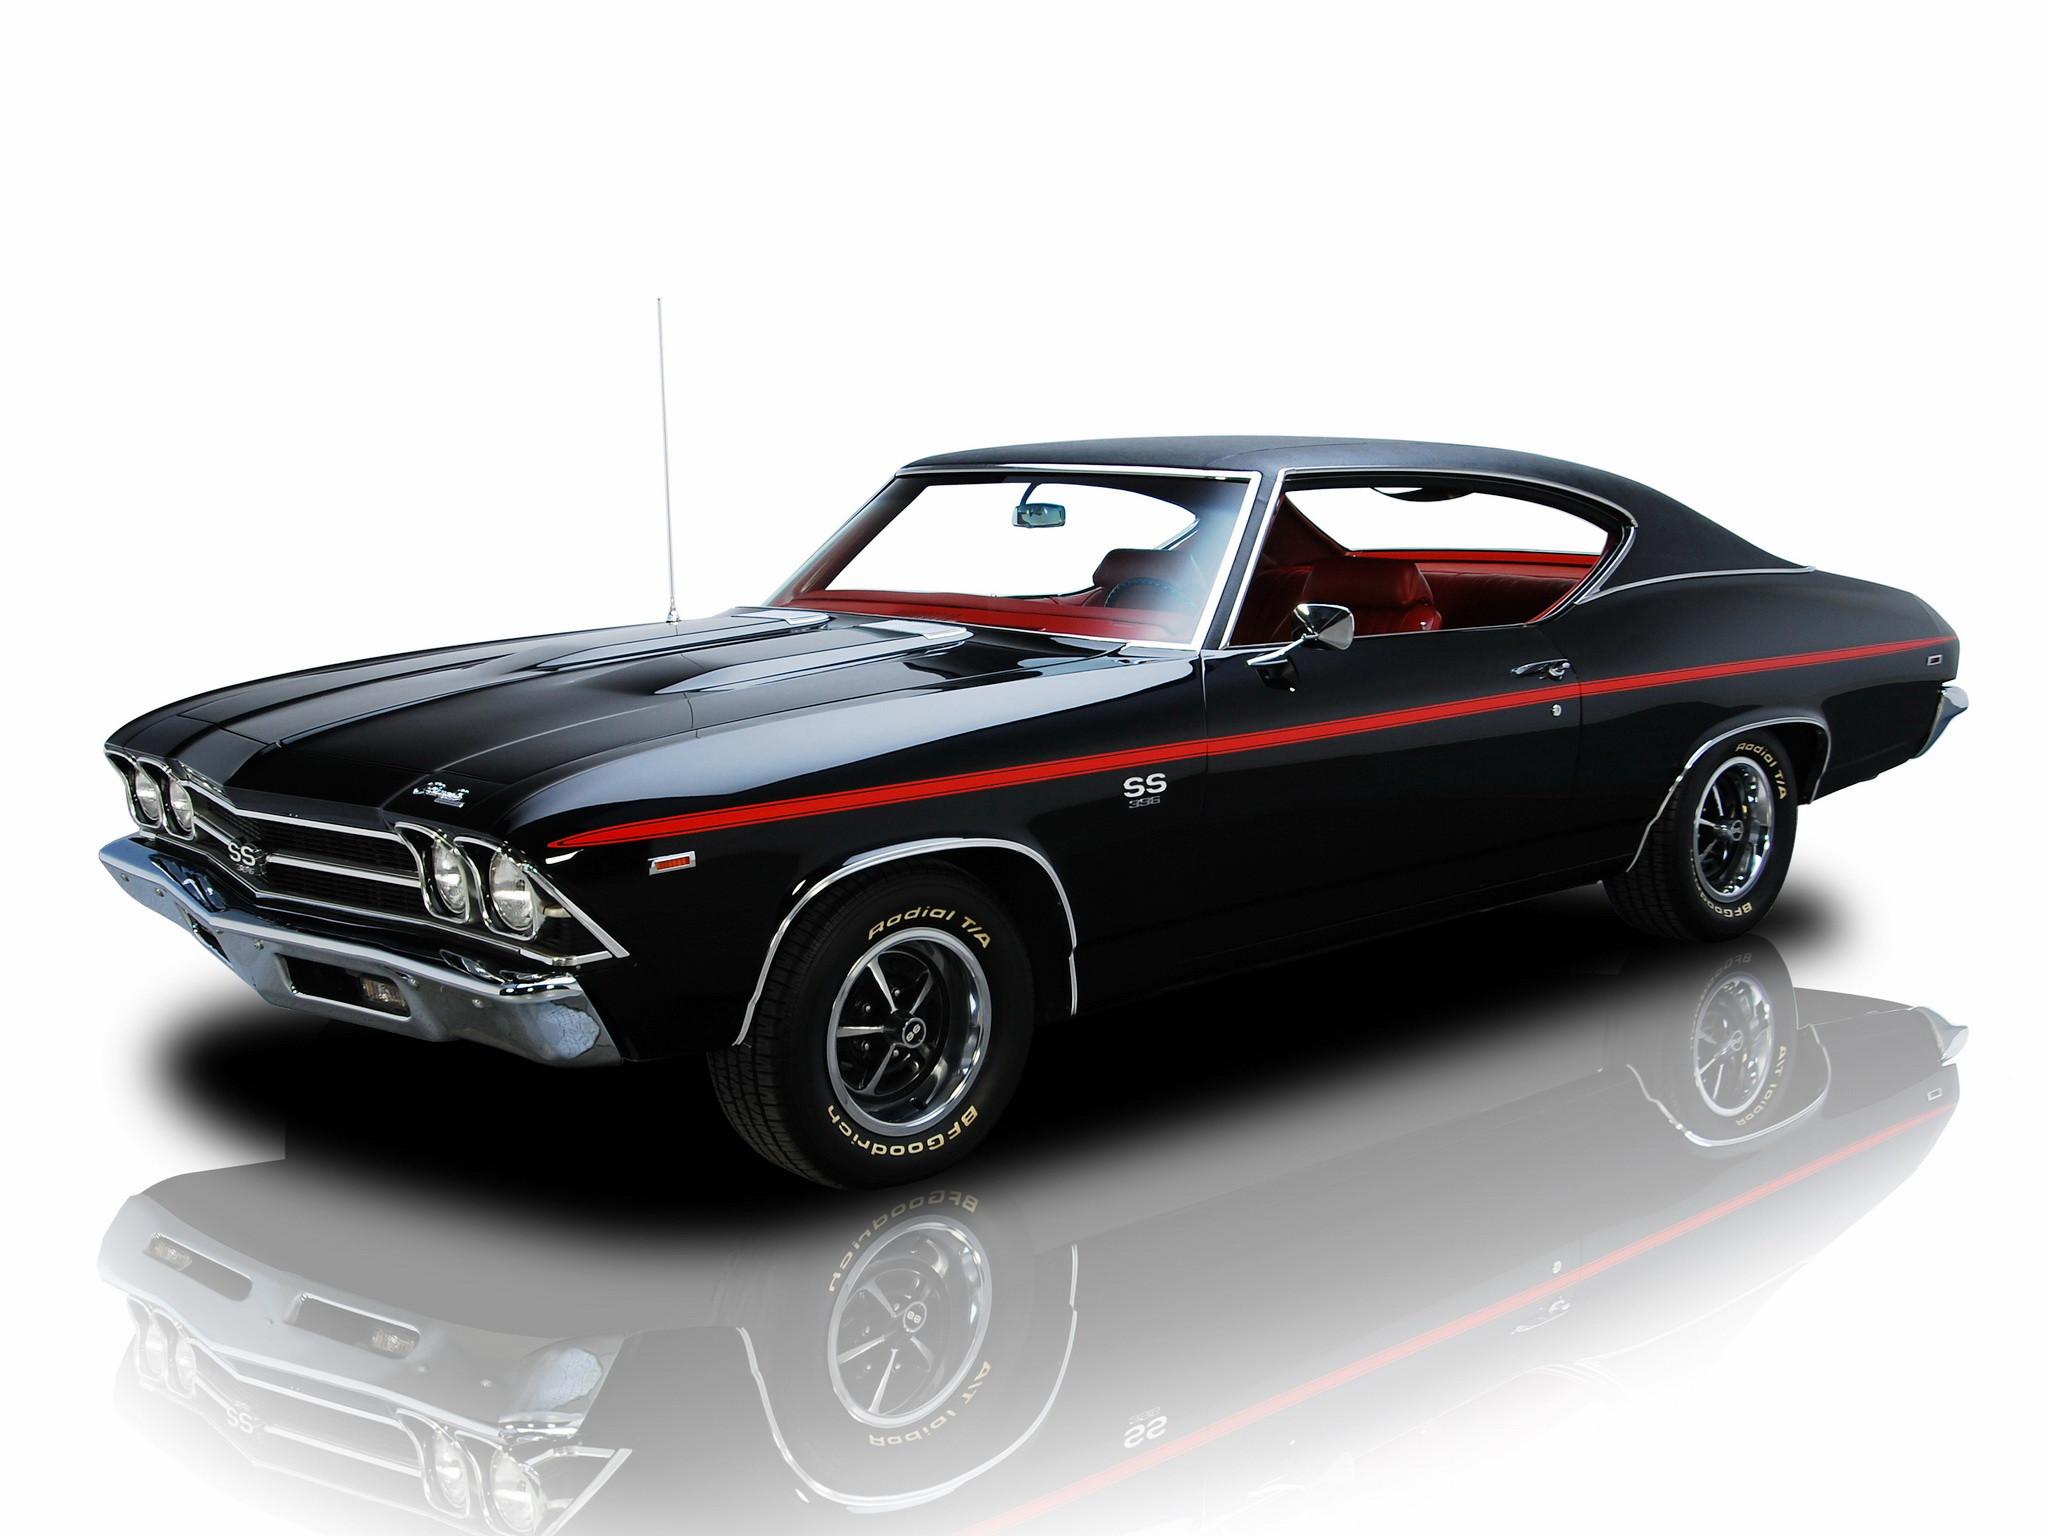 1969 chevrolet ss 396 chevelle   Chevrolet Chevelle SS 396 Hardtop Coupe ' 1969